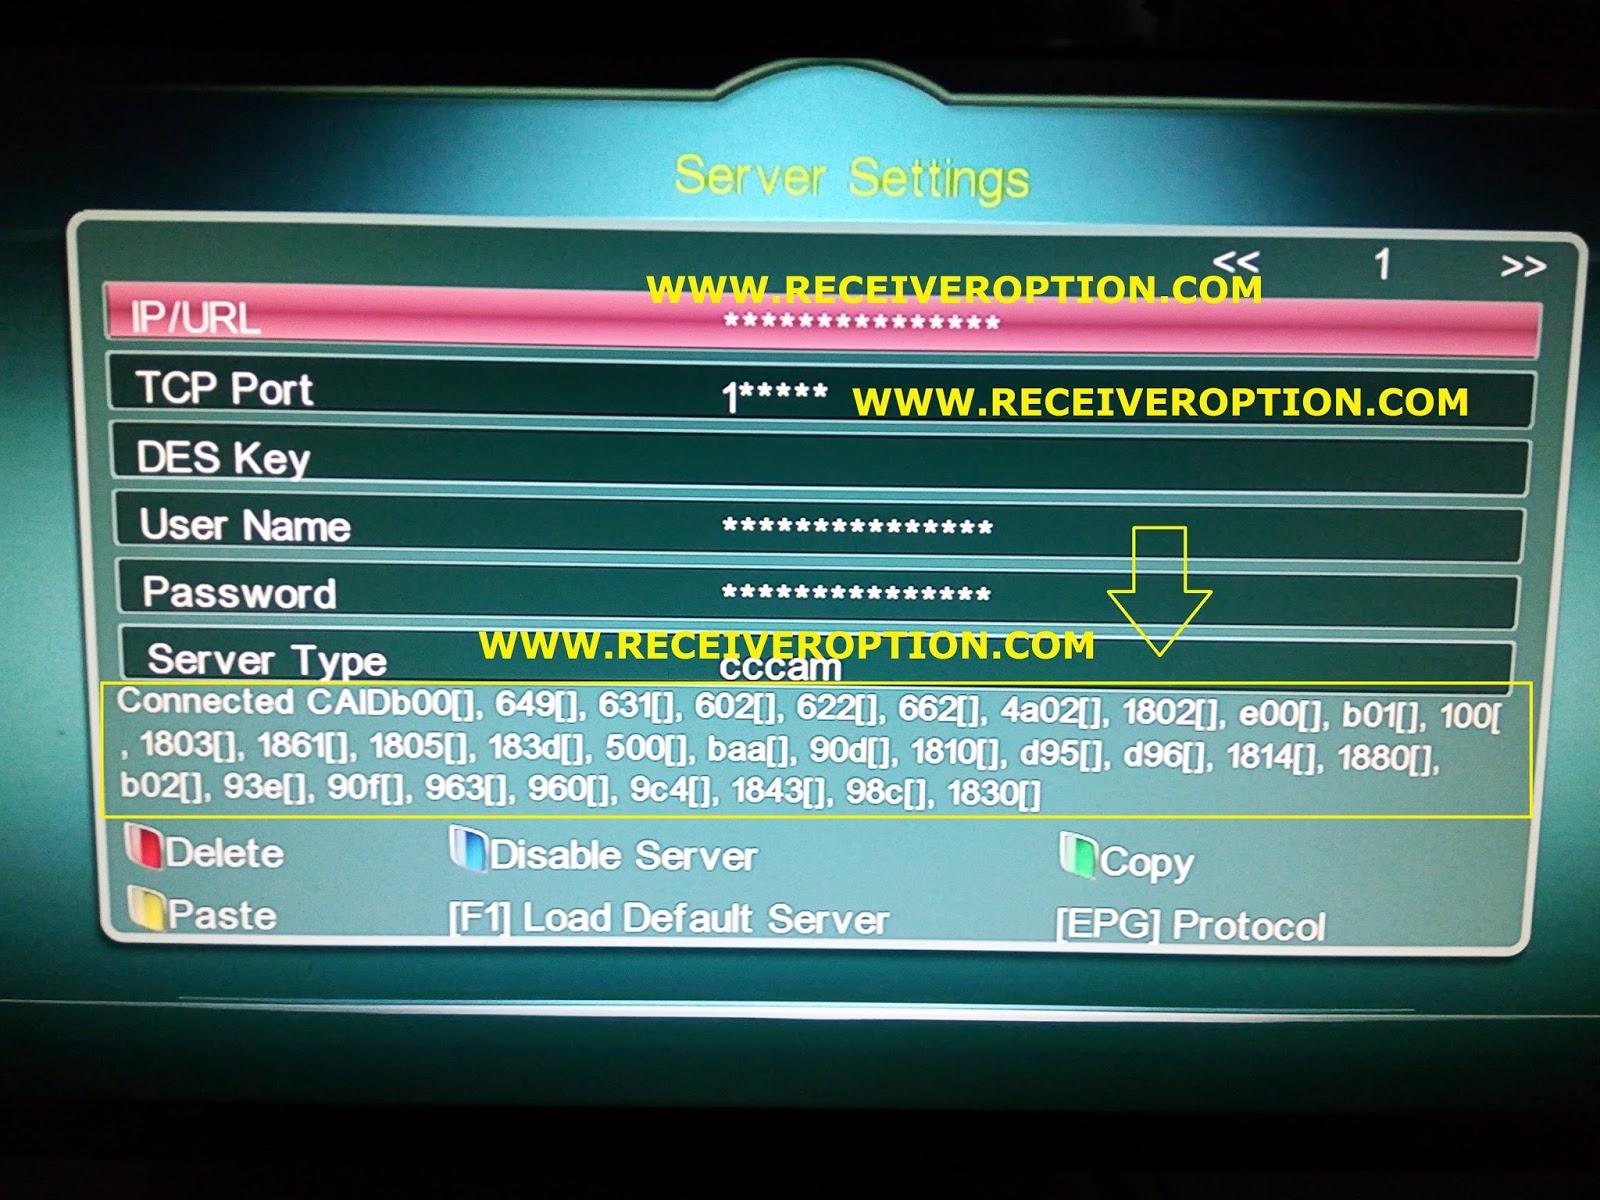 SUPER MAX SM 3000 HD 3G RECEIVER CCCAM OPTION - HOW TO ENTER BISS